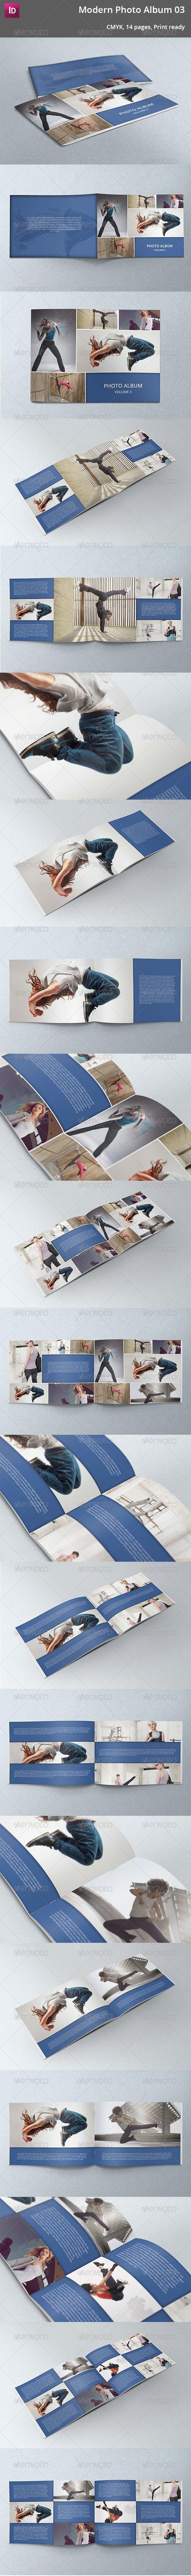 Modern Photo Album 03 - #Photo #Albums Print #Templates Download here: https://graphicriver.net/item/modern-photo-album-03/5355261?ref=alena994